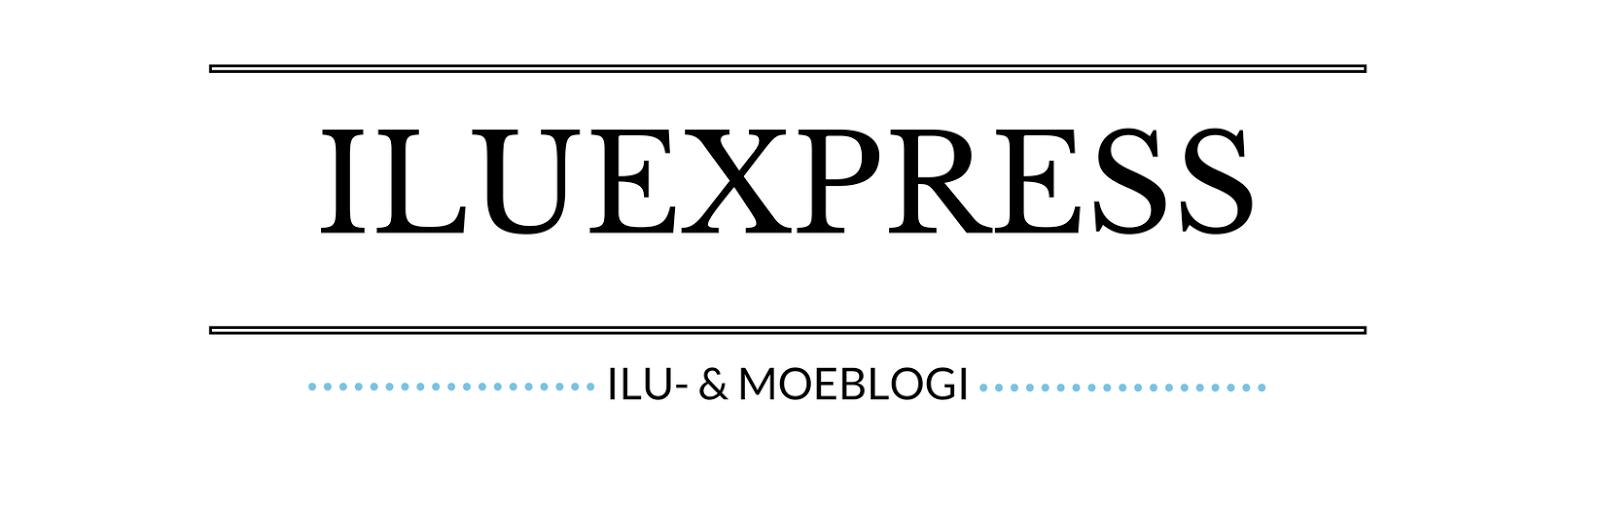 Iluexpress